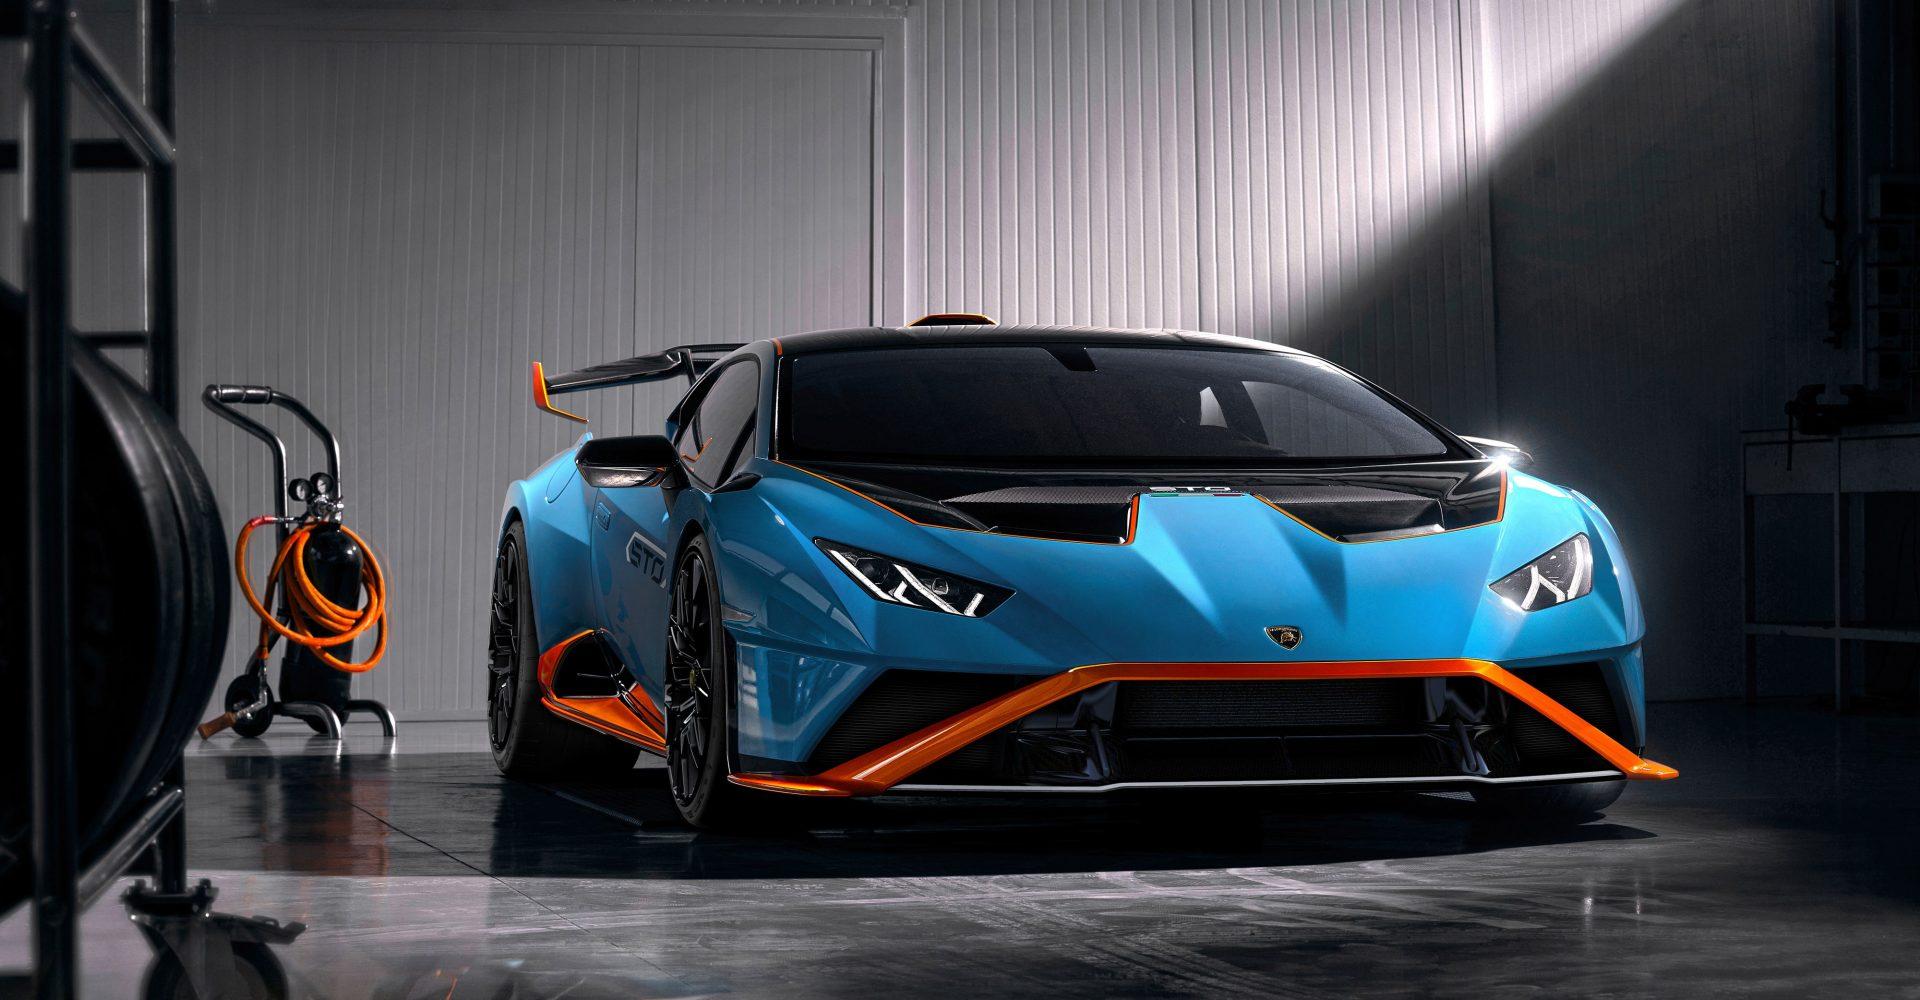 Lamborghini Huracan STO brings track-focused tech to the road